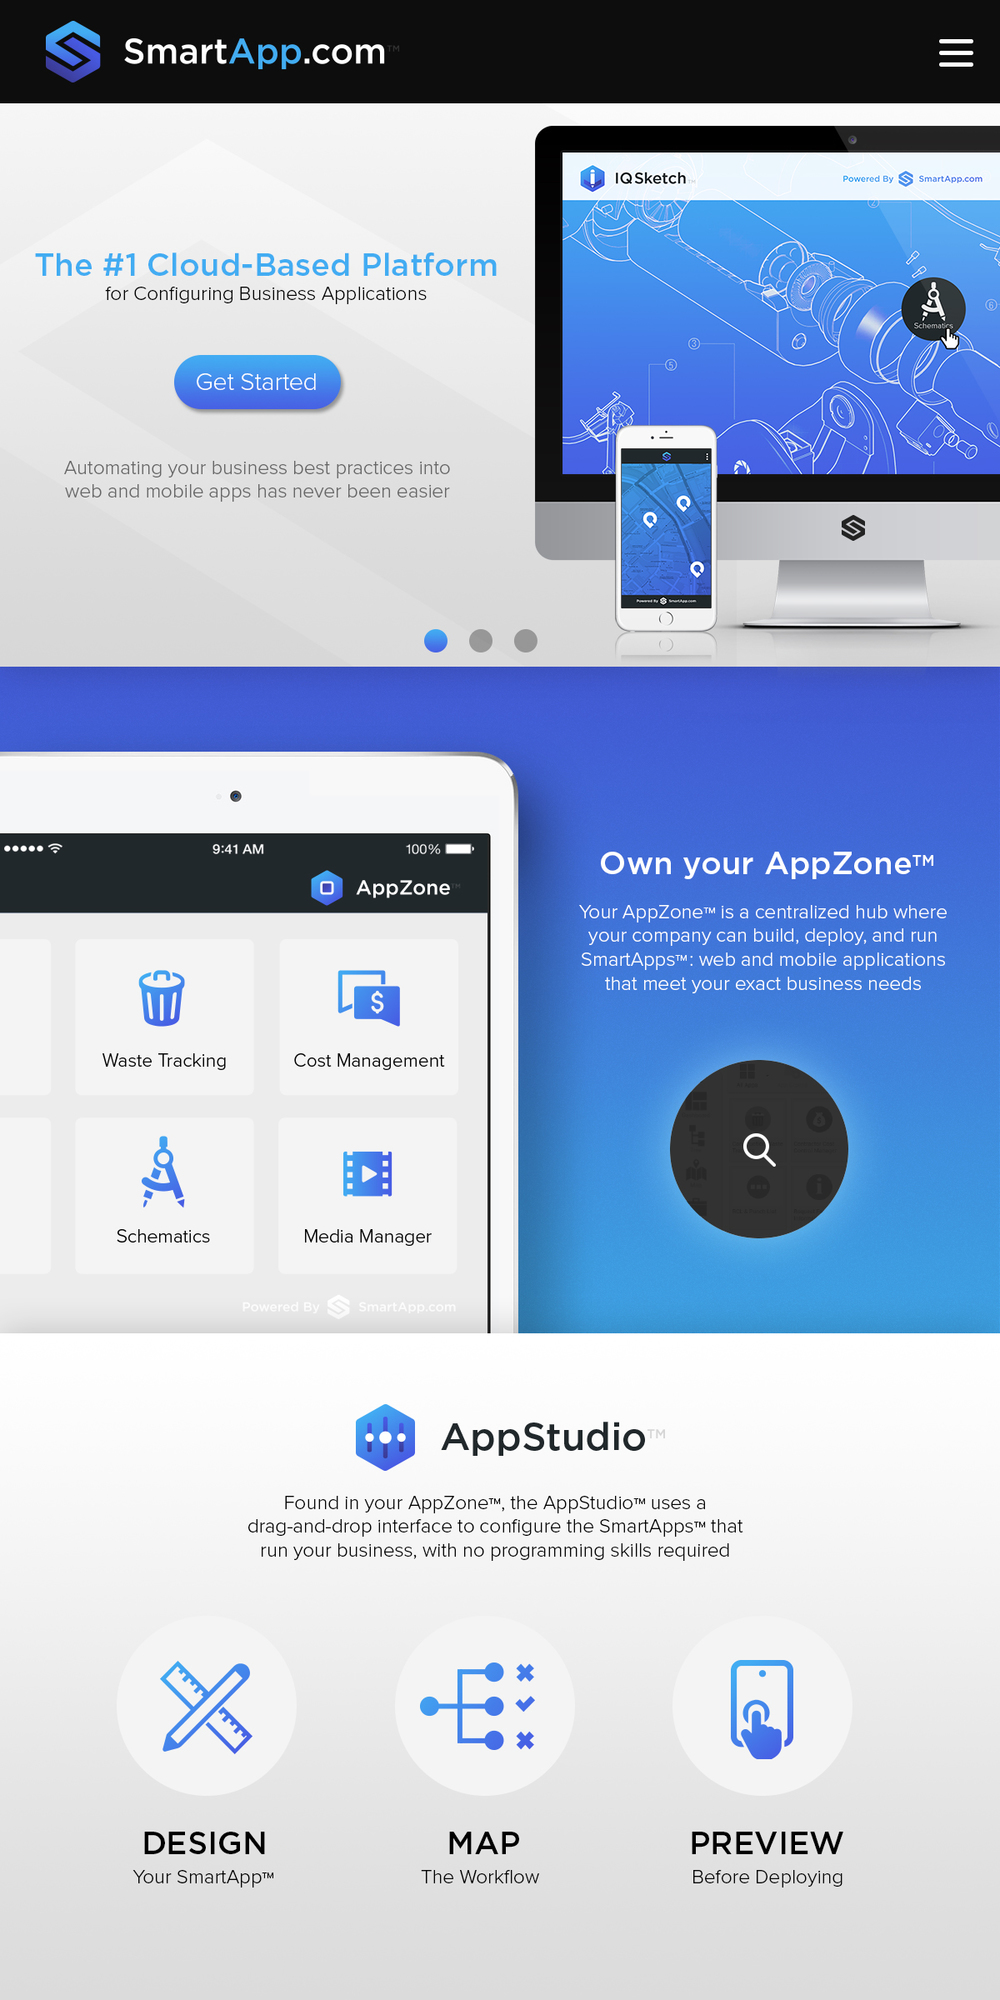 smartapp-home_01.jpg